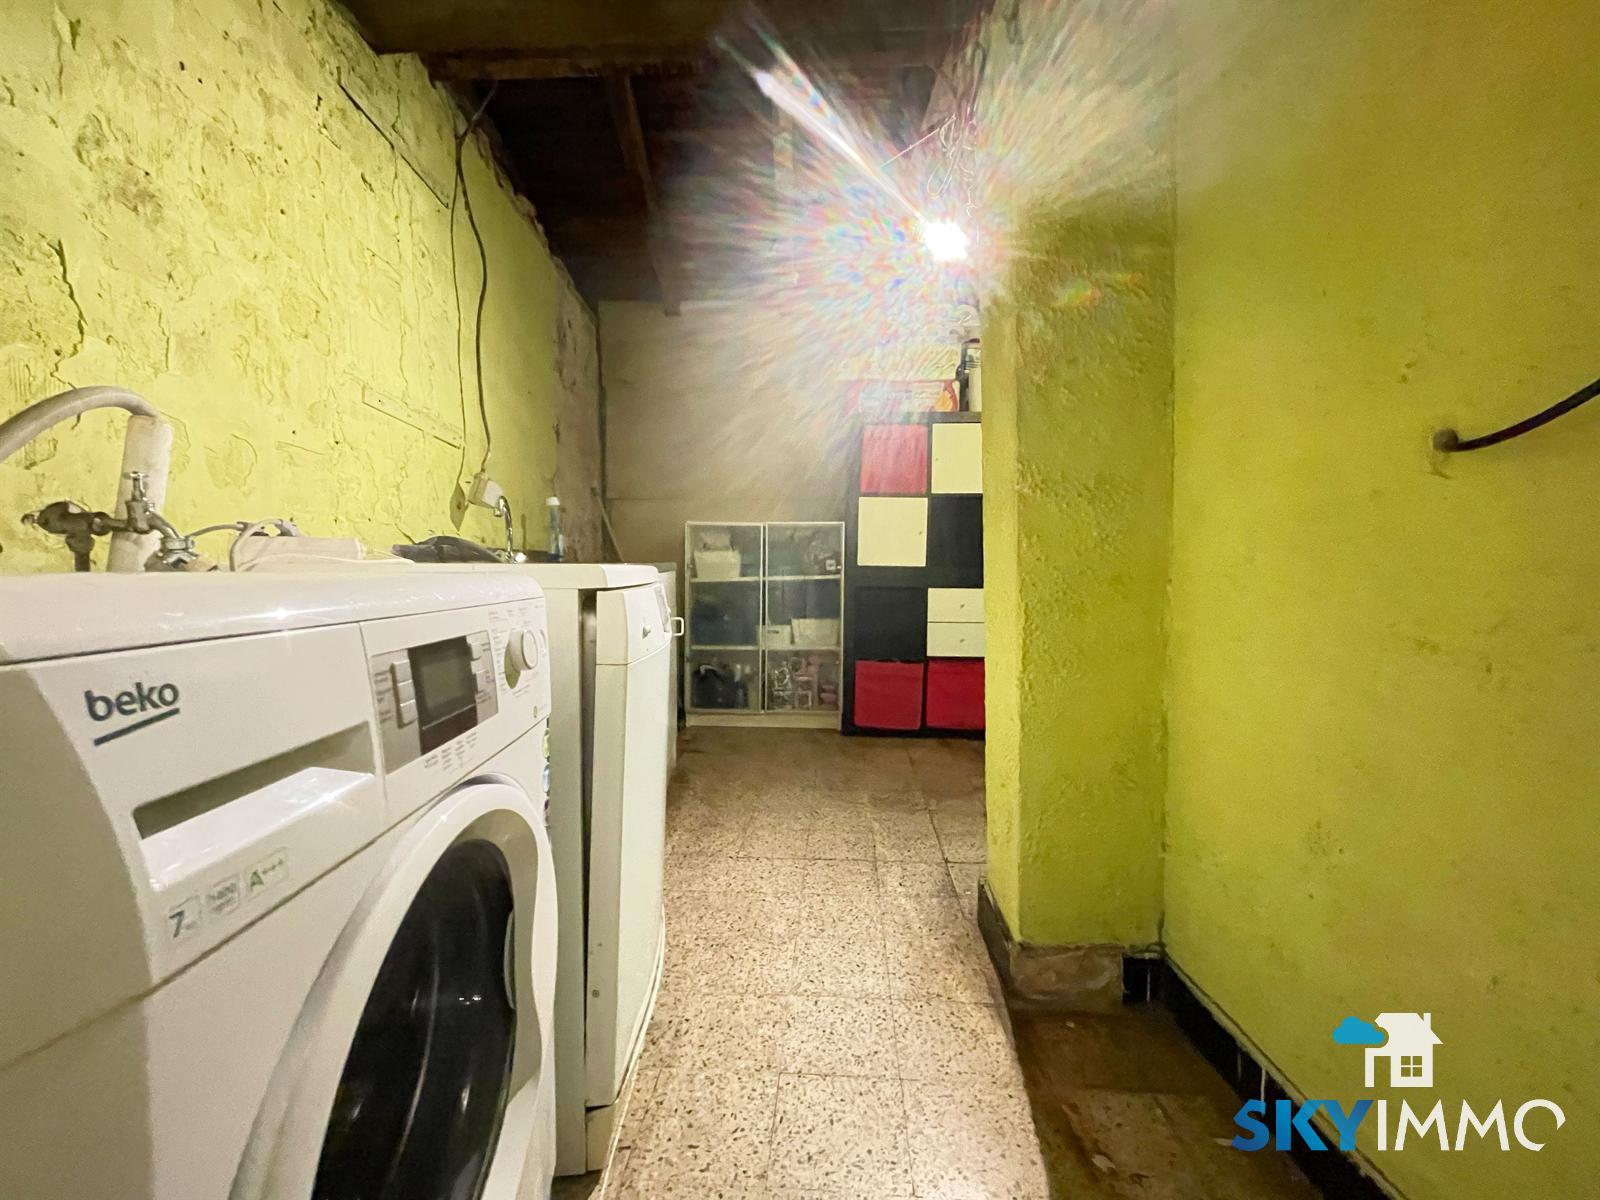 Maison - Seraing Jemeppesur-Meuse - #4517380-13